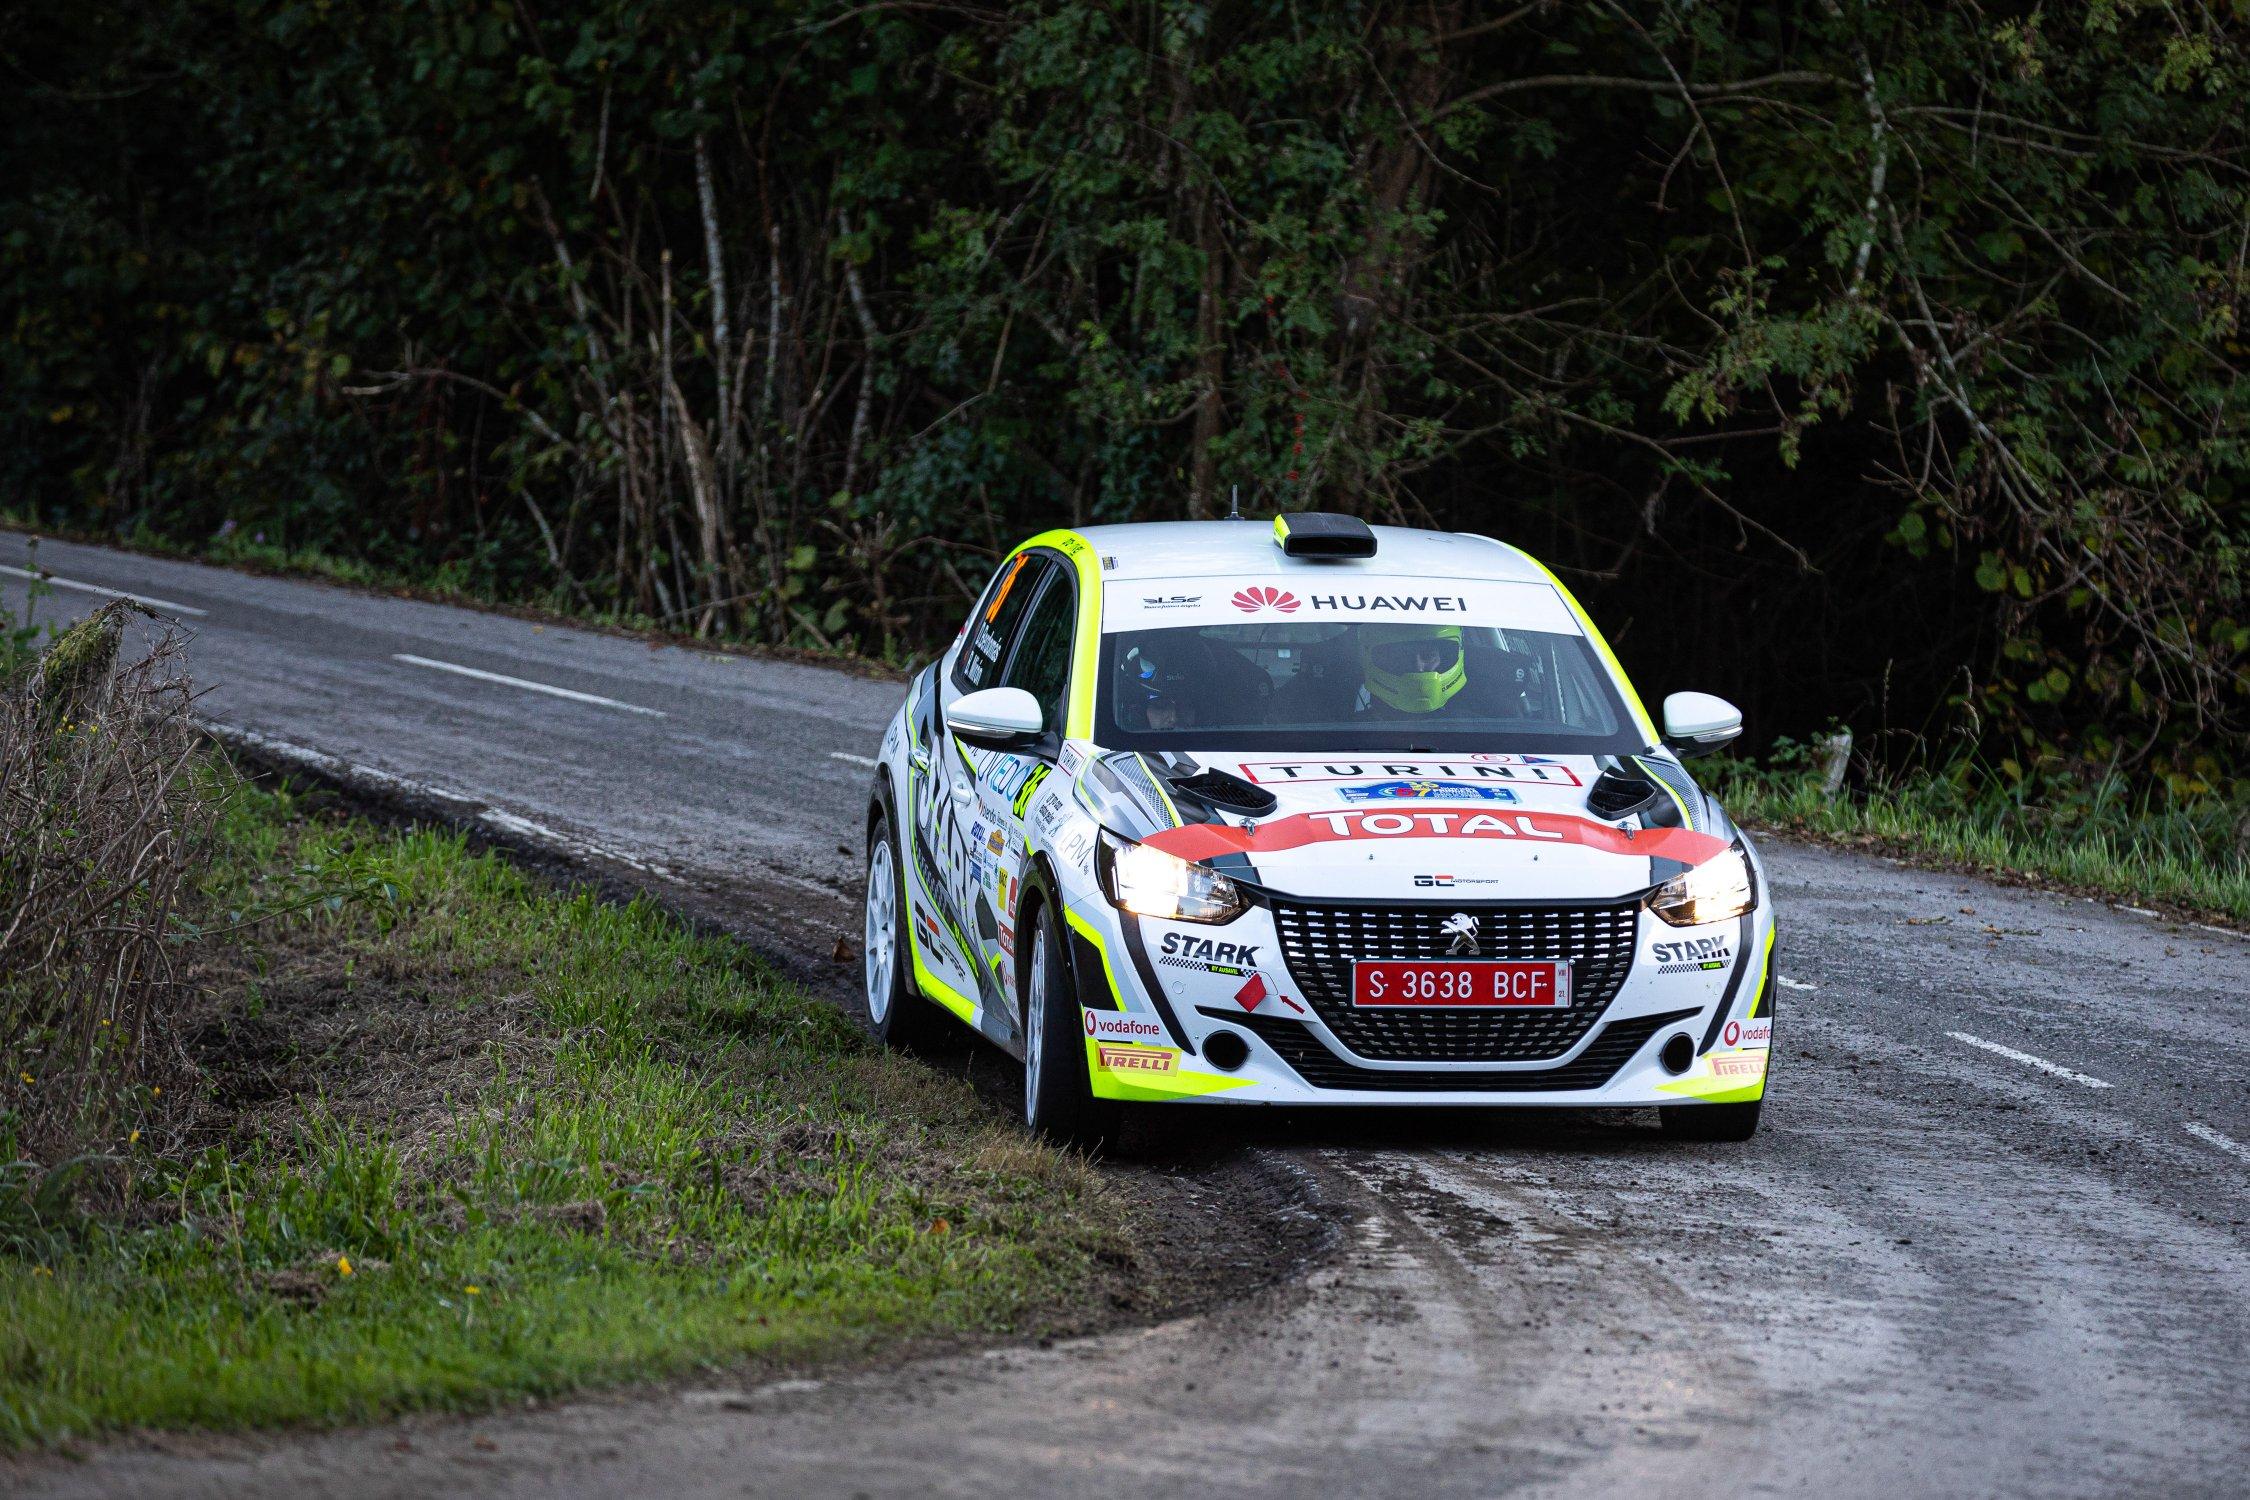 CERA + ERT: 57º Rallye Princesa de Asturias - Ciudad de Oviedo [23-24 Octubre] - Página 4 ElHn2UNXIAEgw_7?format=jpg&name=4096x4096